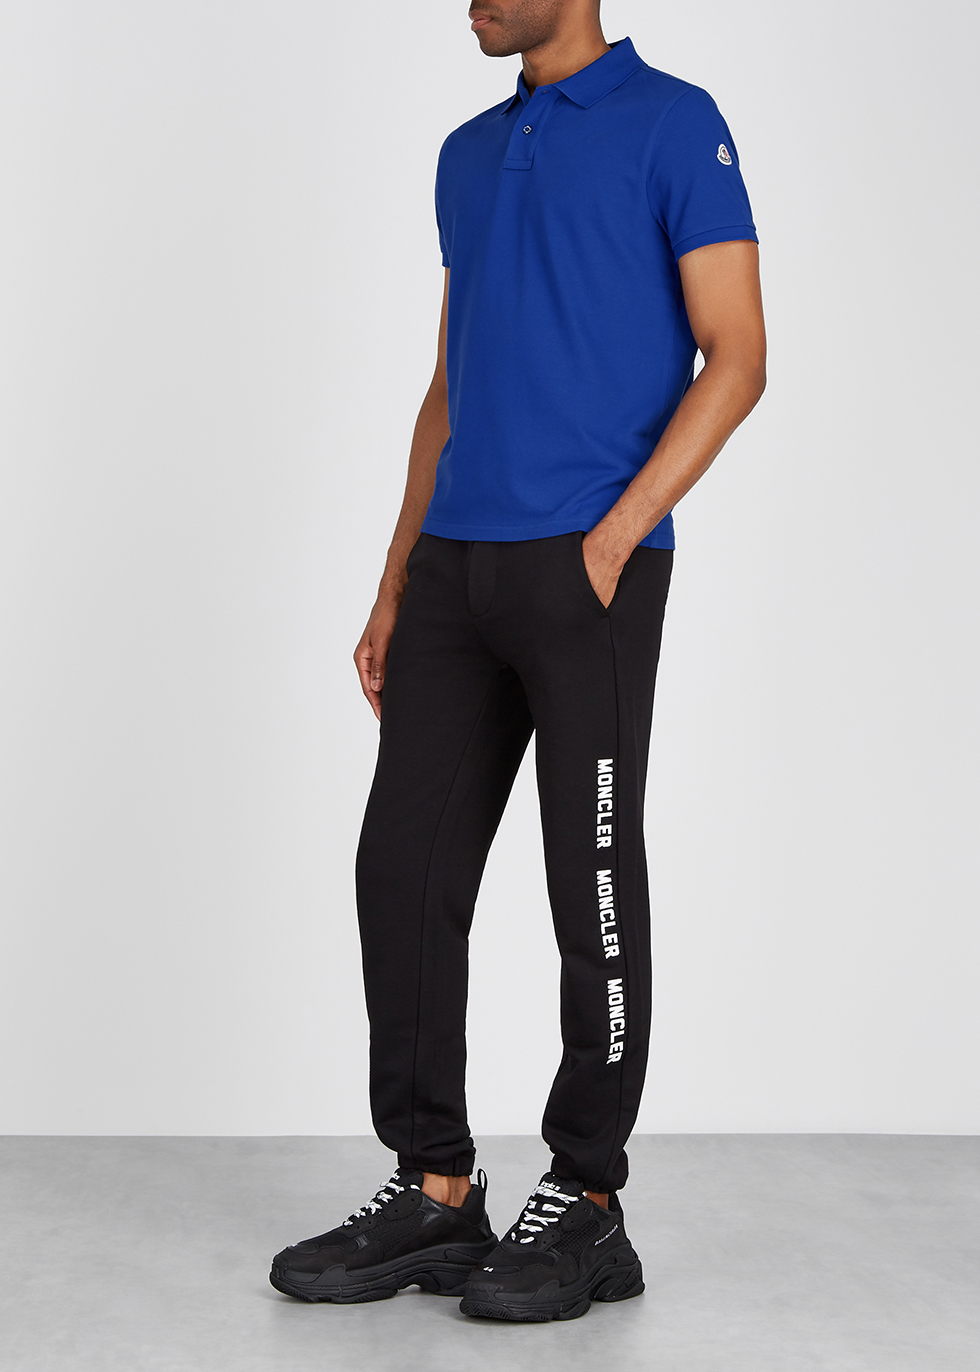 754744e3b Men's Designer Polo Shirts - Polo Shirts For Men - Harvey Nichols